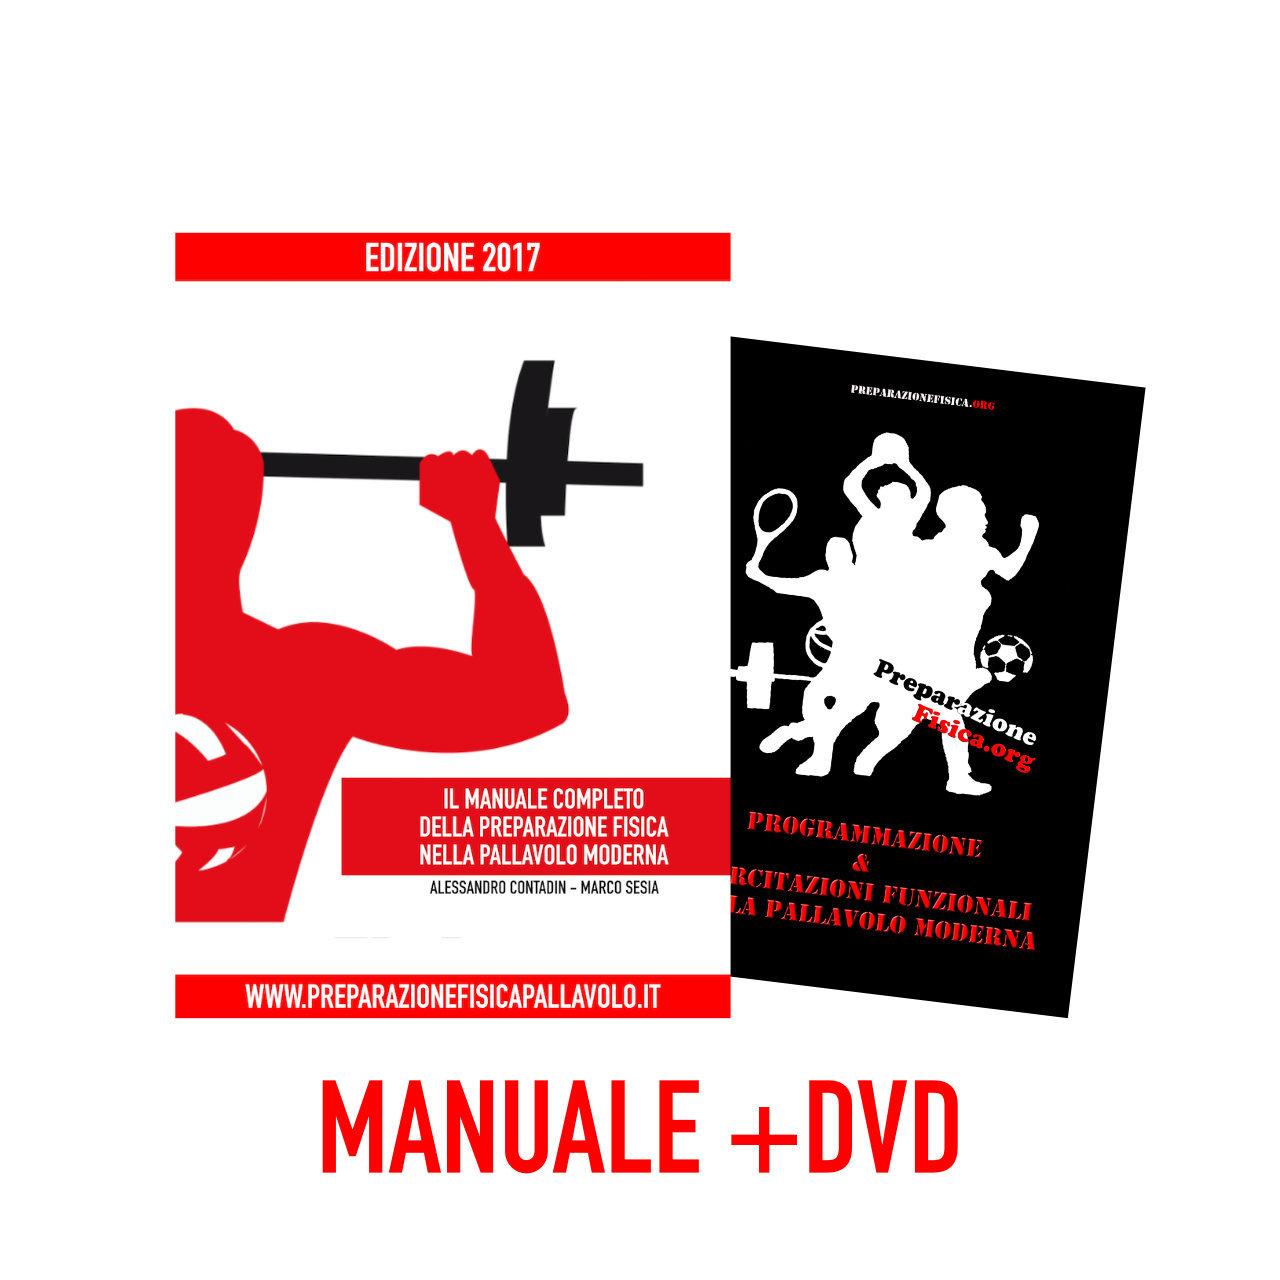 Manuale + DVD